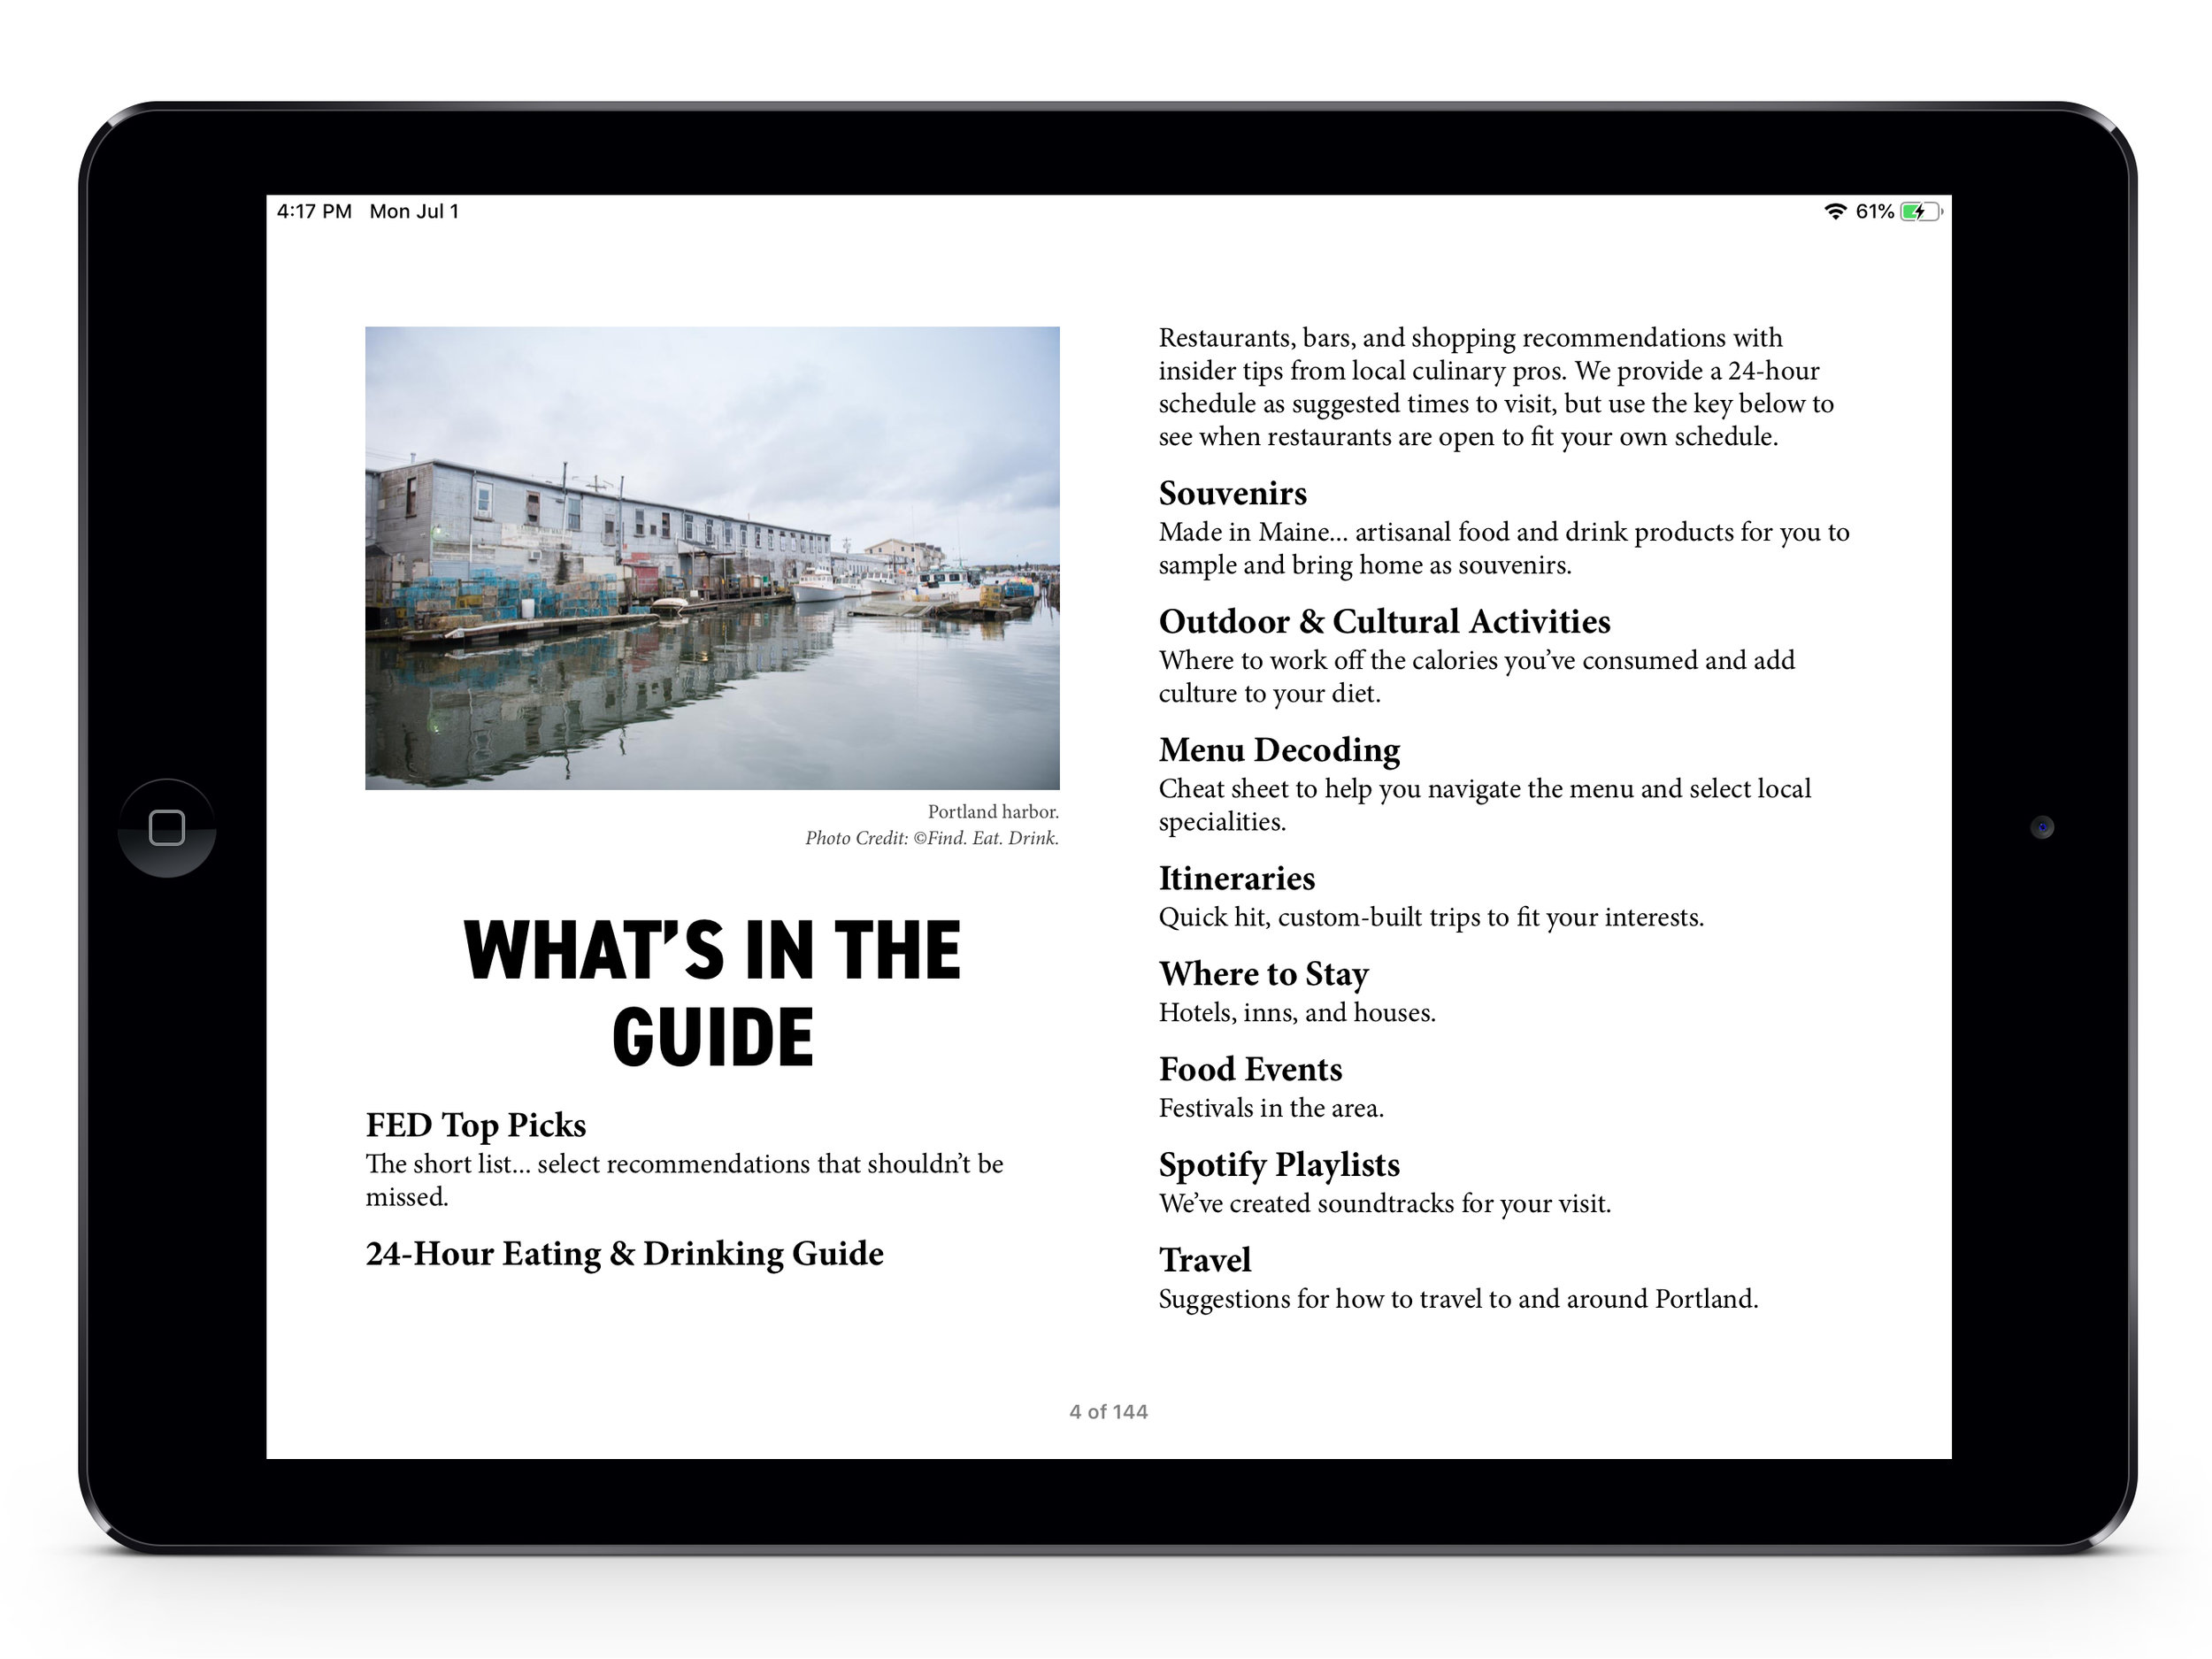 iPadAir_PortlandME_Screenshots_Landscape_1.2.jpg